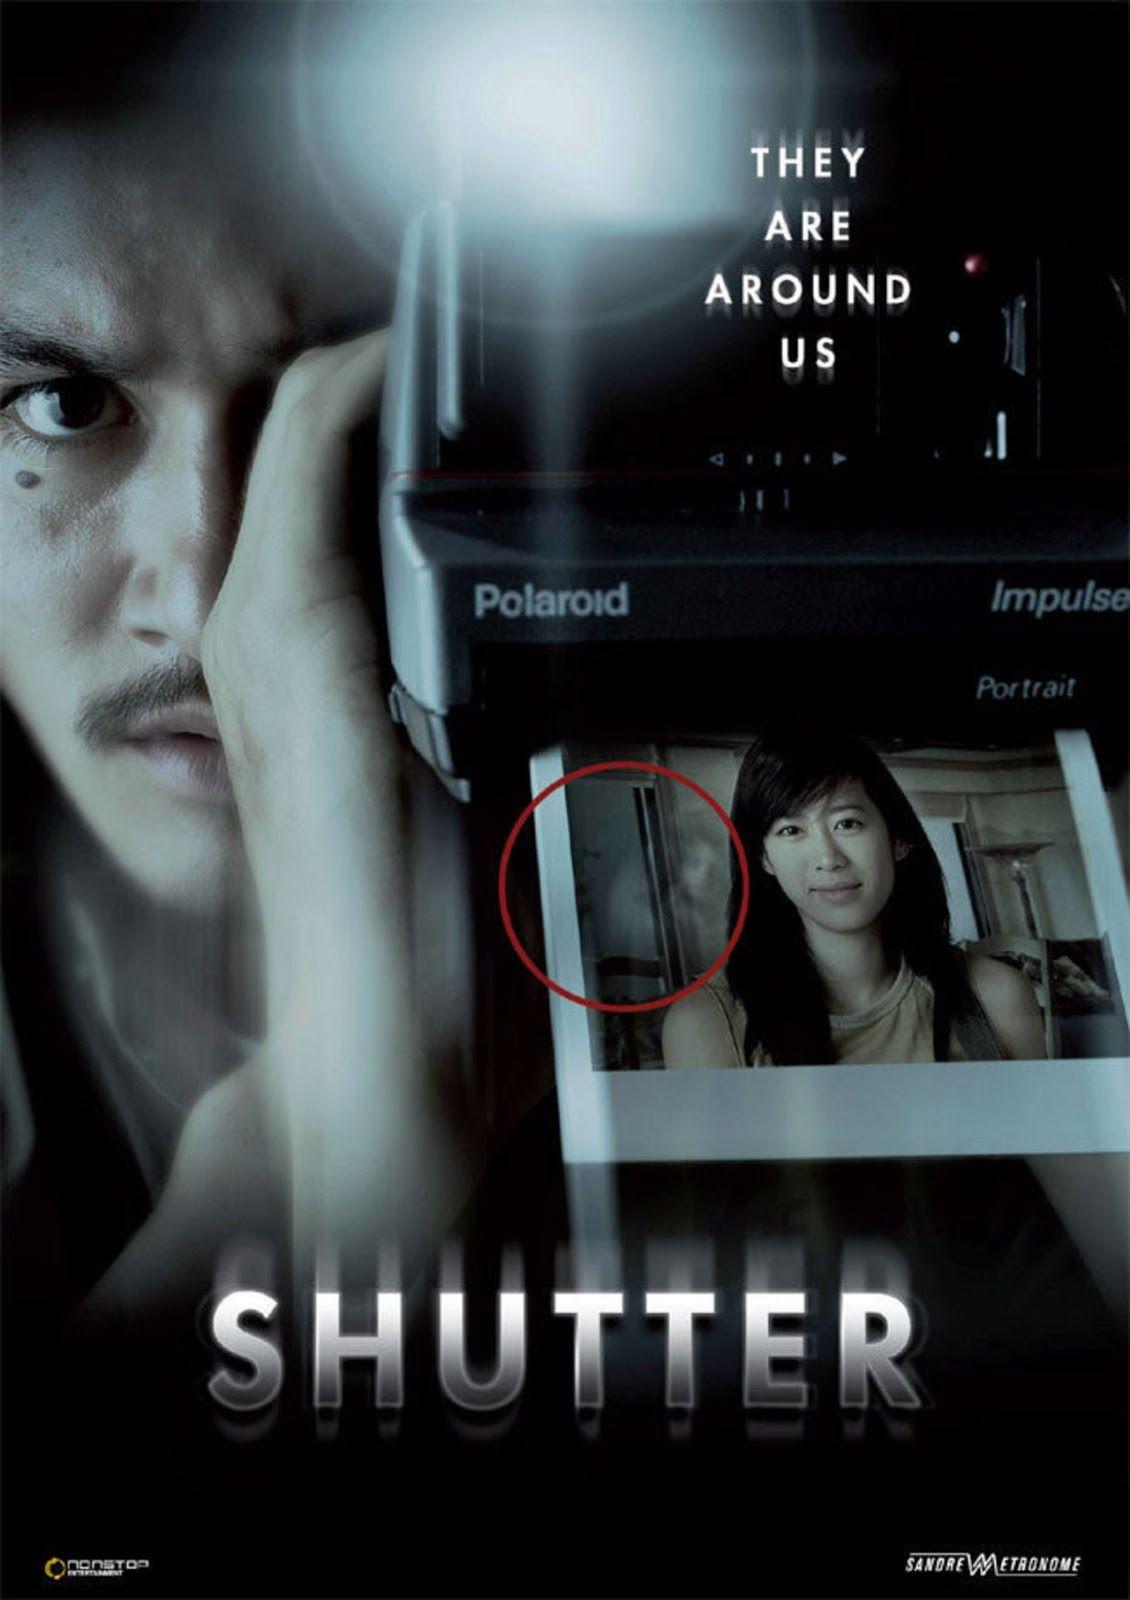 Shutter 2004 Subtitle Indonesia Shutter Film Thailand